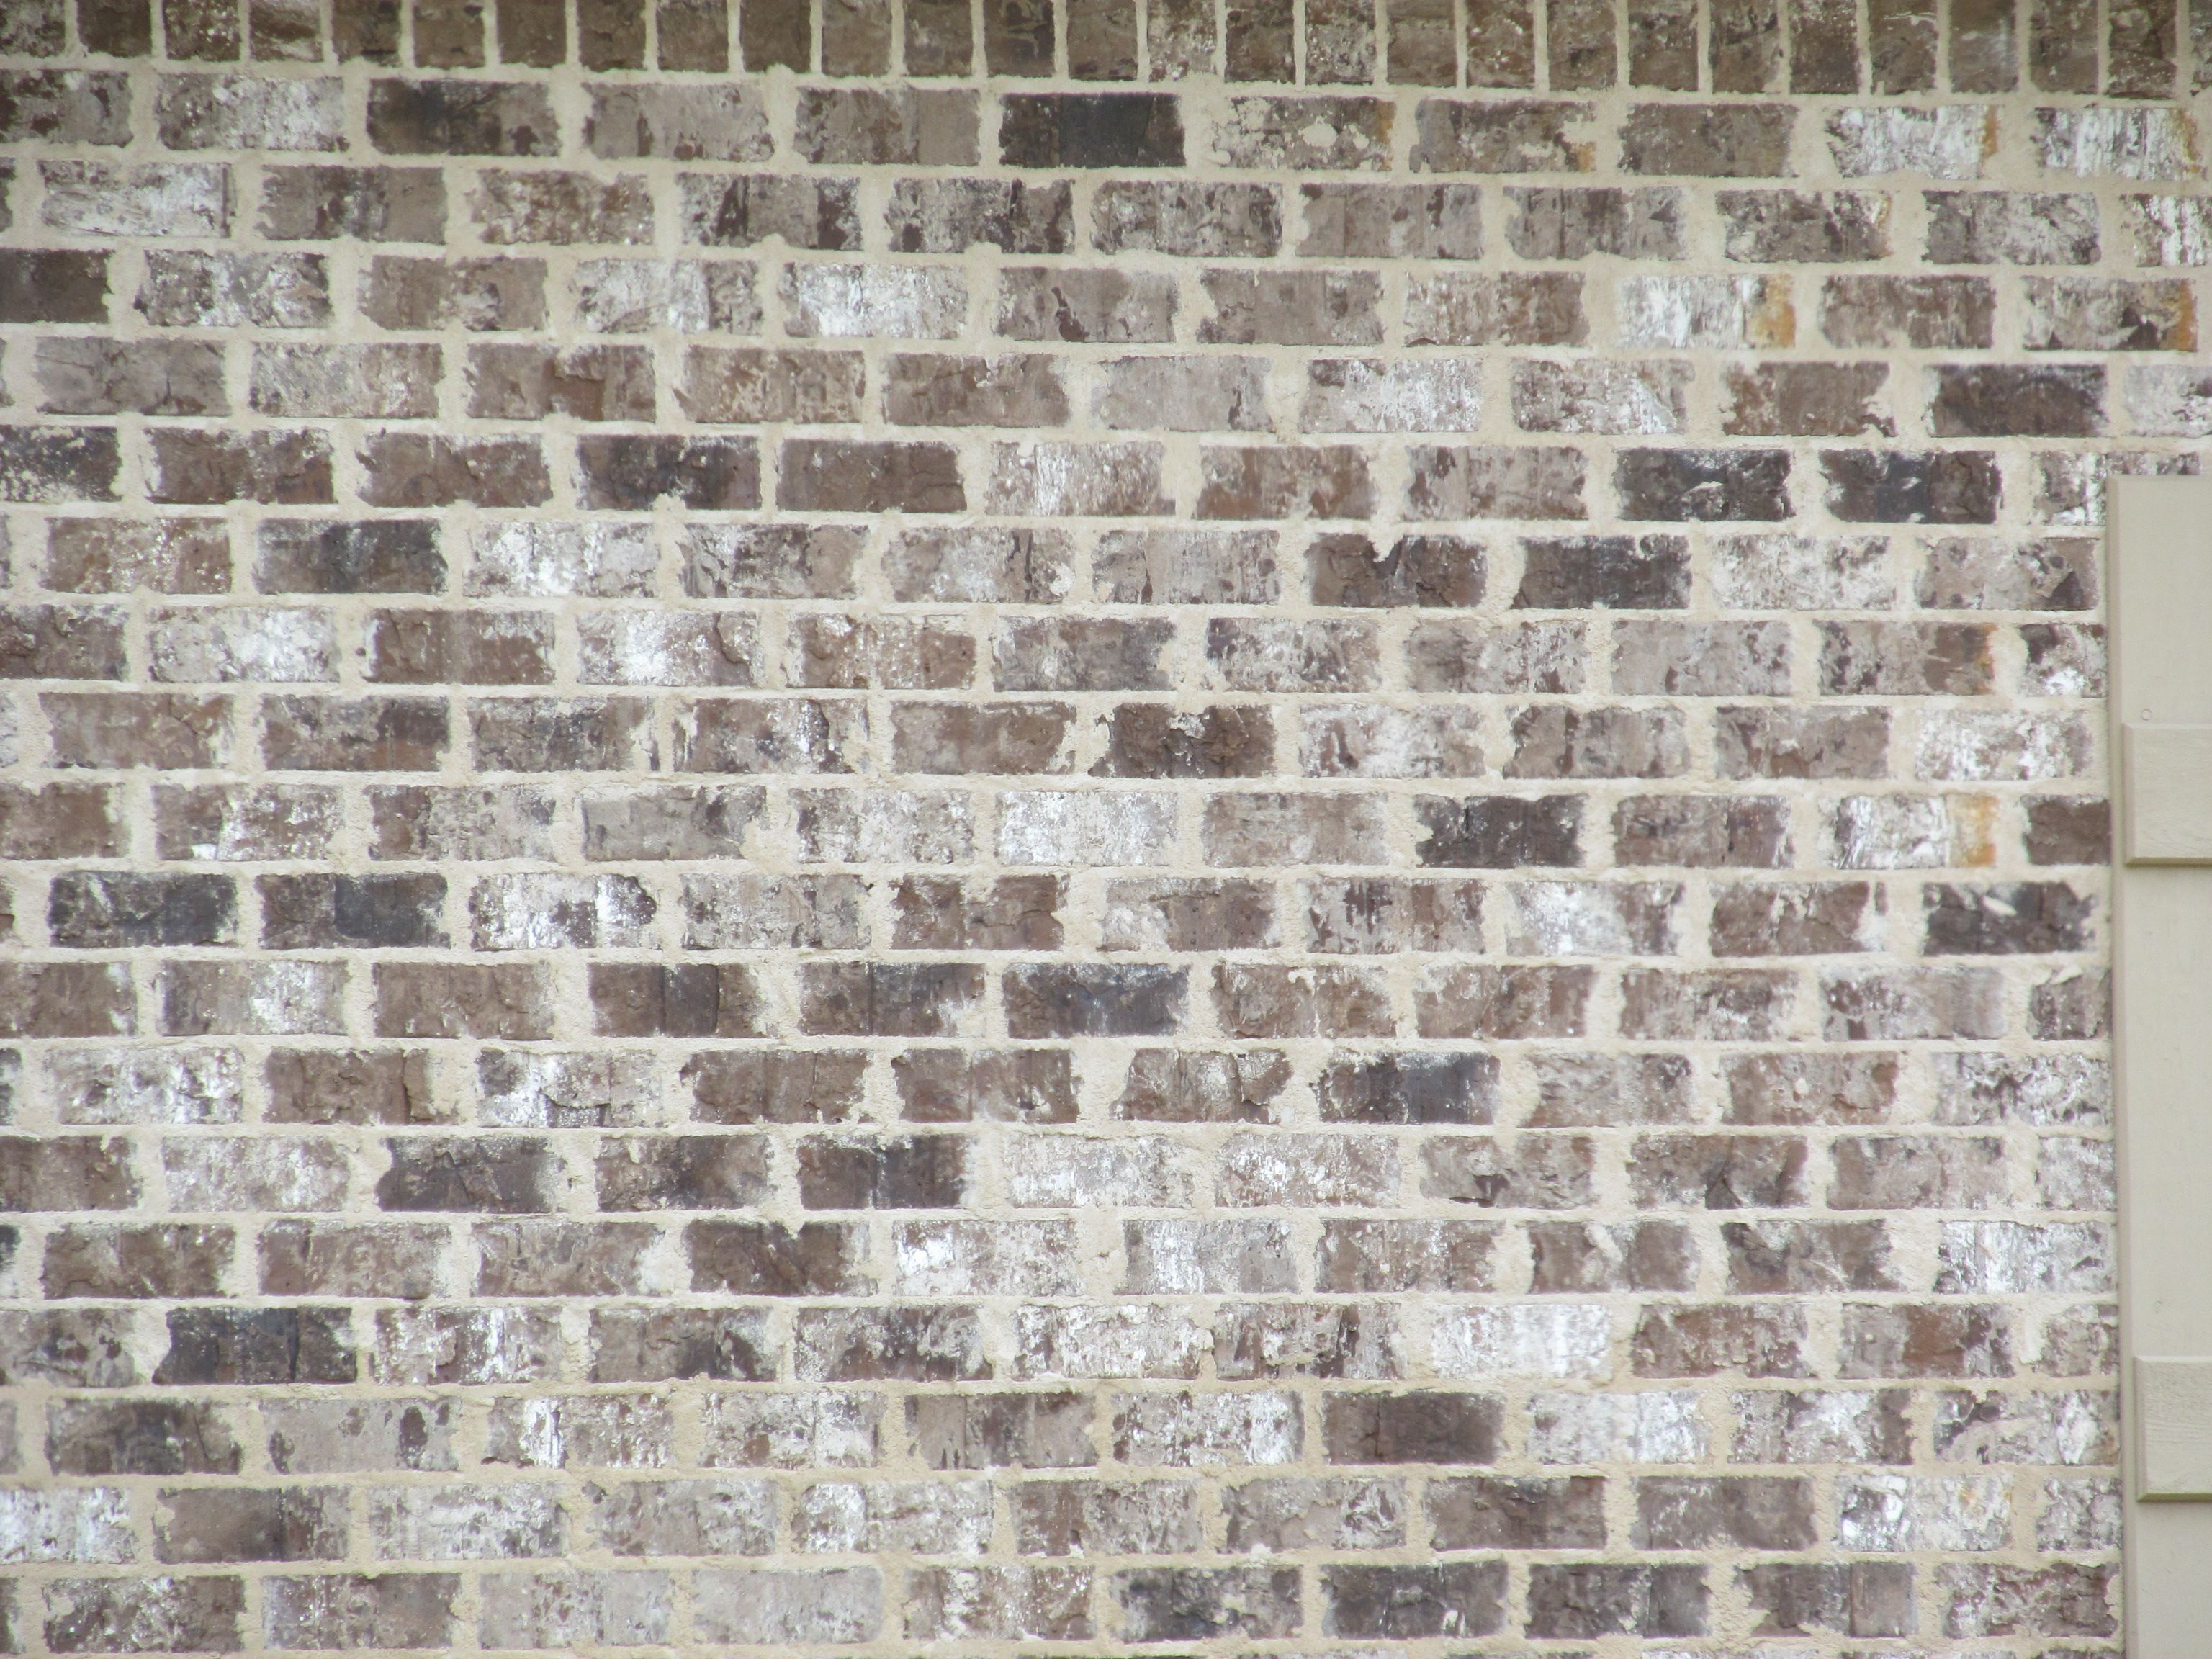 Ashton Ivory Buff Mortar Columbus Ms Brick Homes